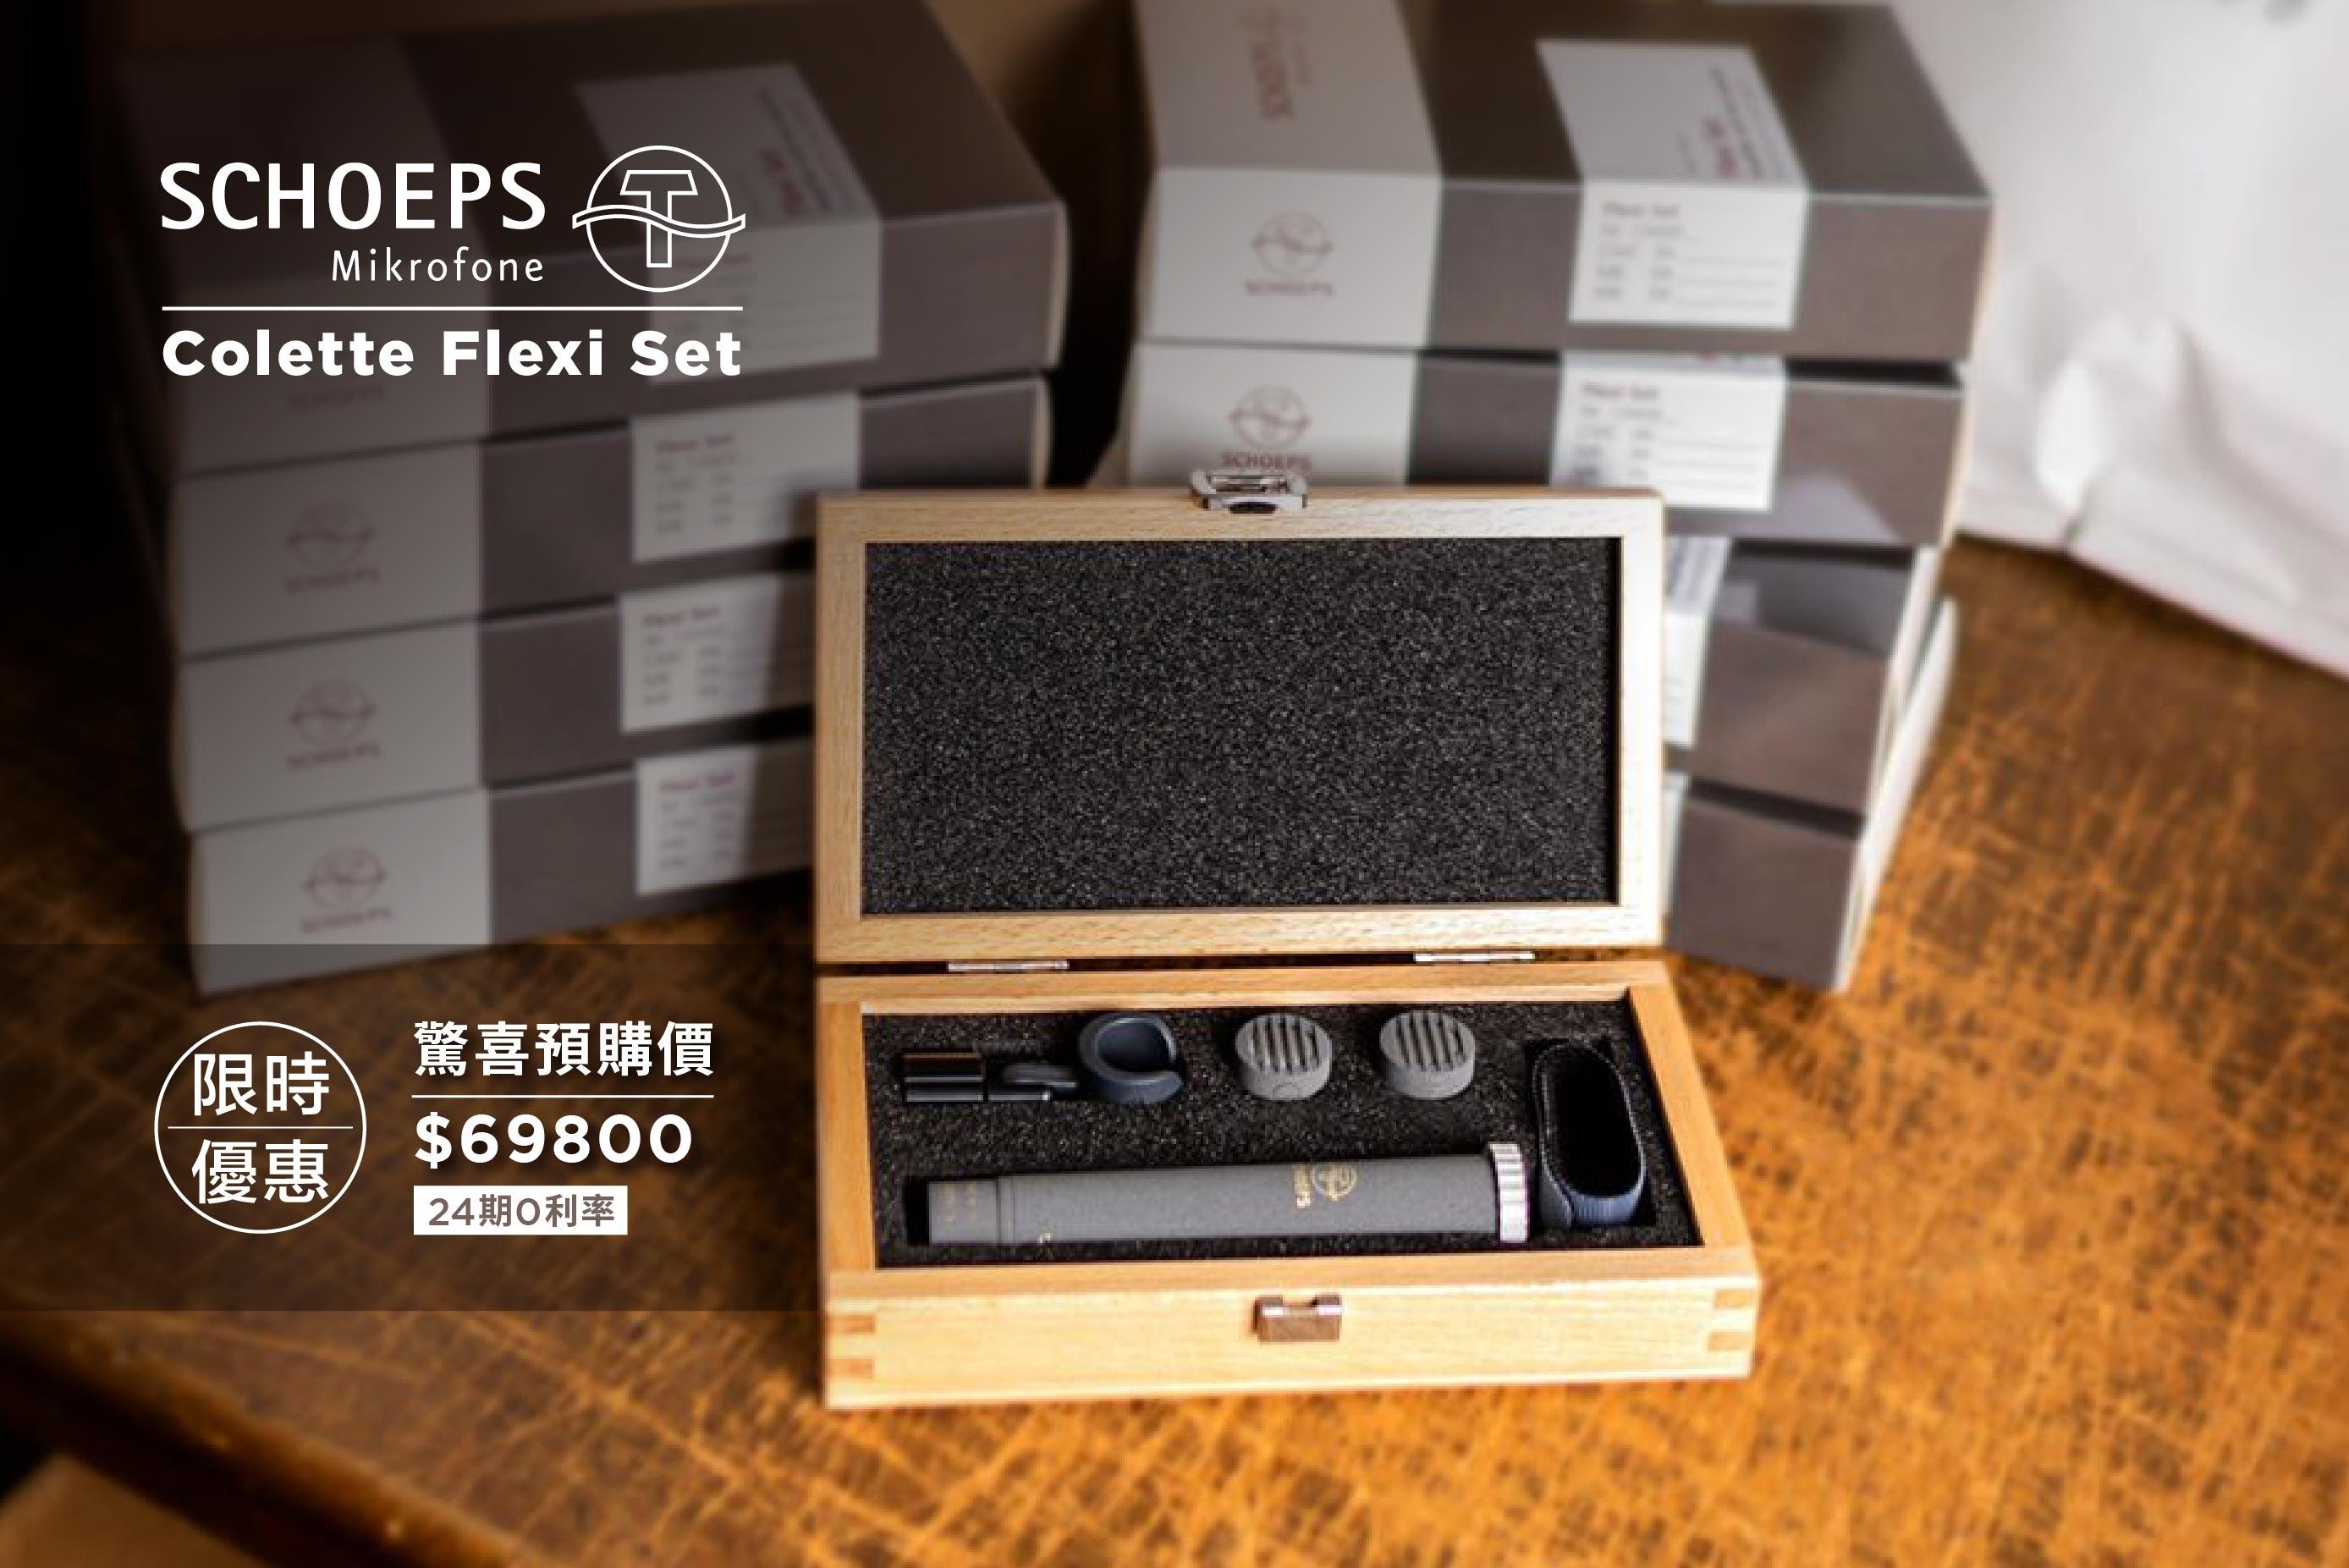 Schoeps Flexi Set CMC 6G 麥克風套組